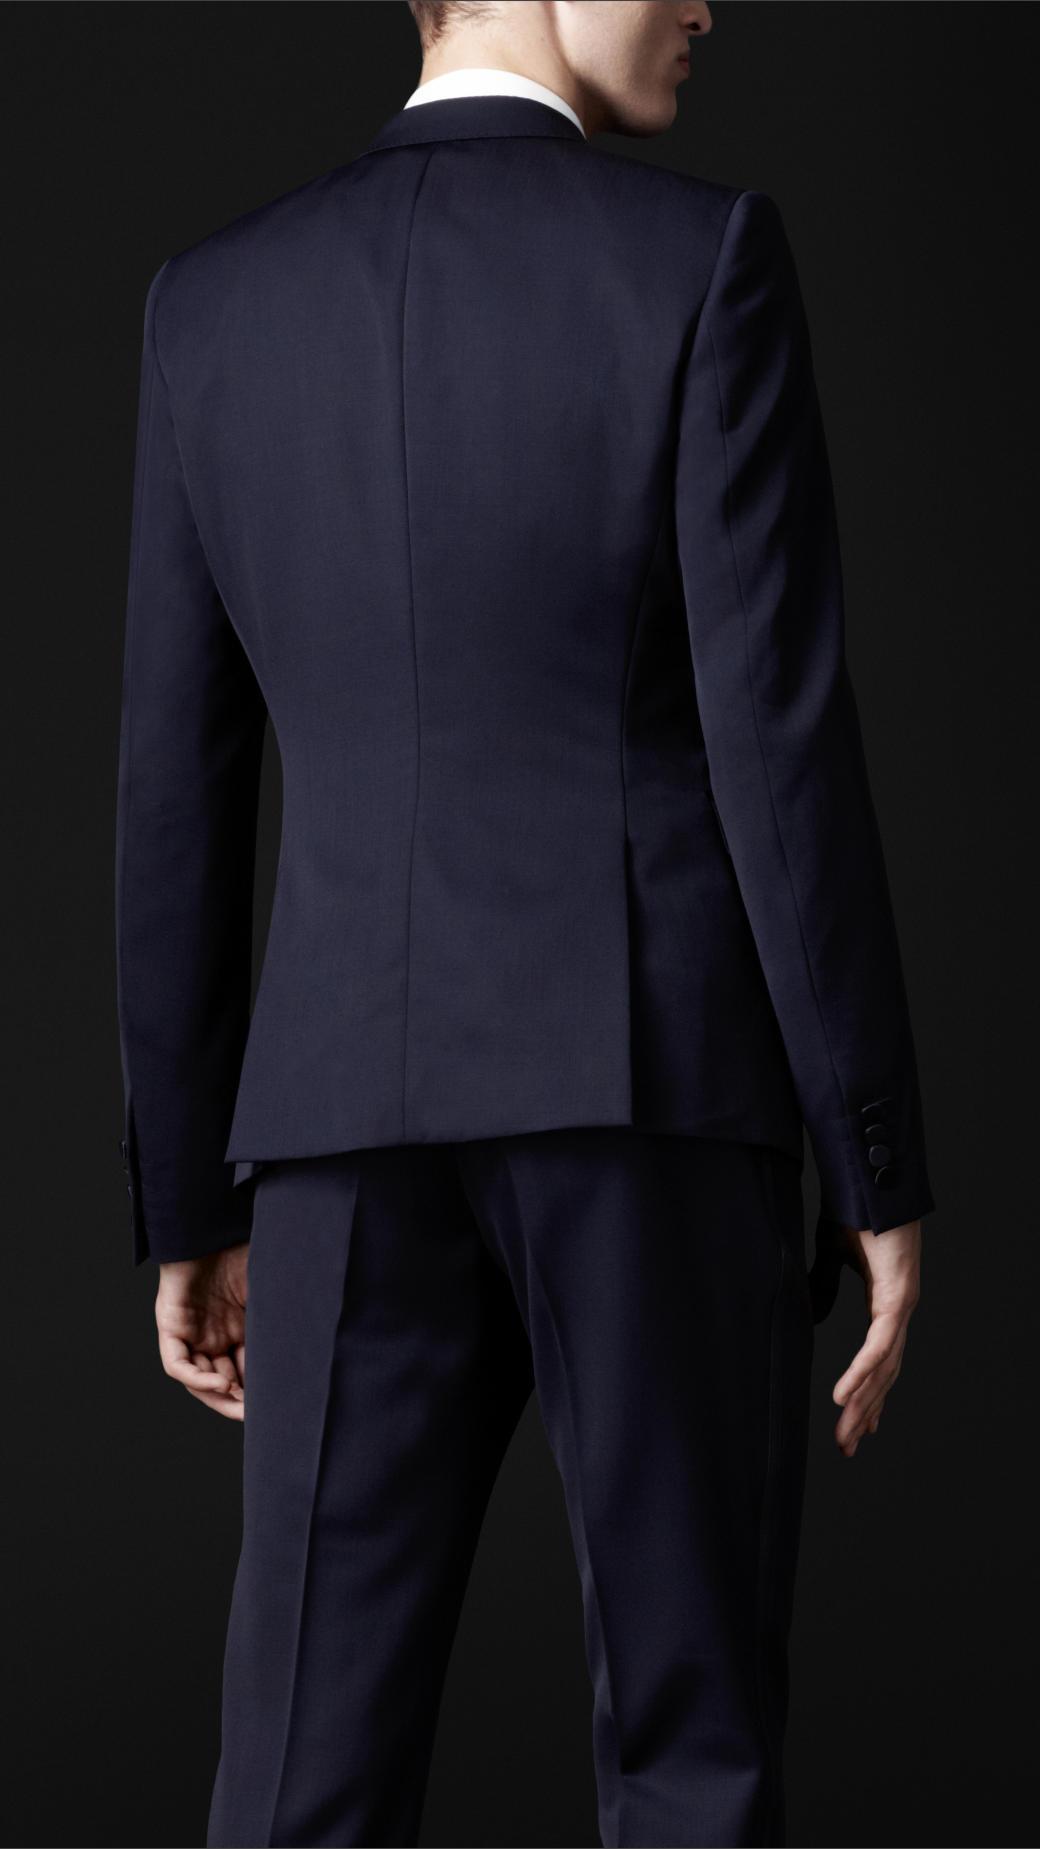 Burberry Prorsum Satin Lapel Dinner Jacket in Navy (Blue) for Men